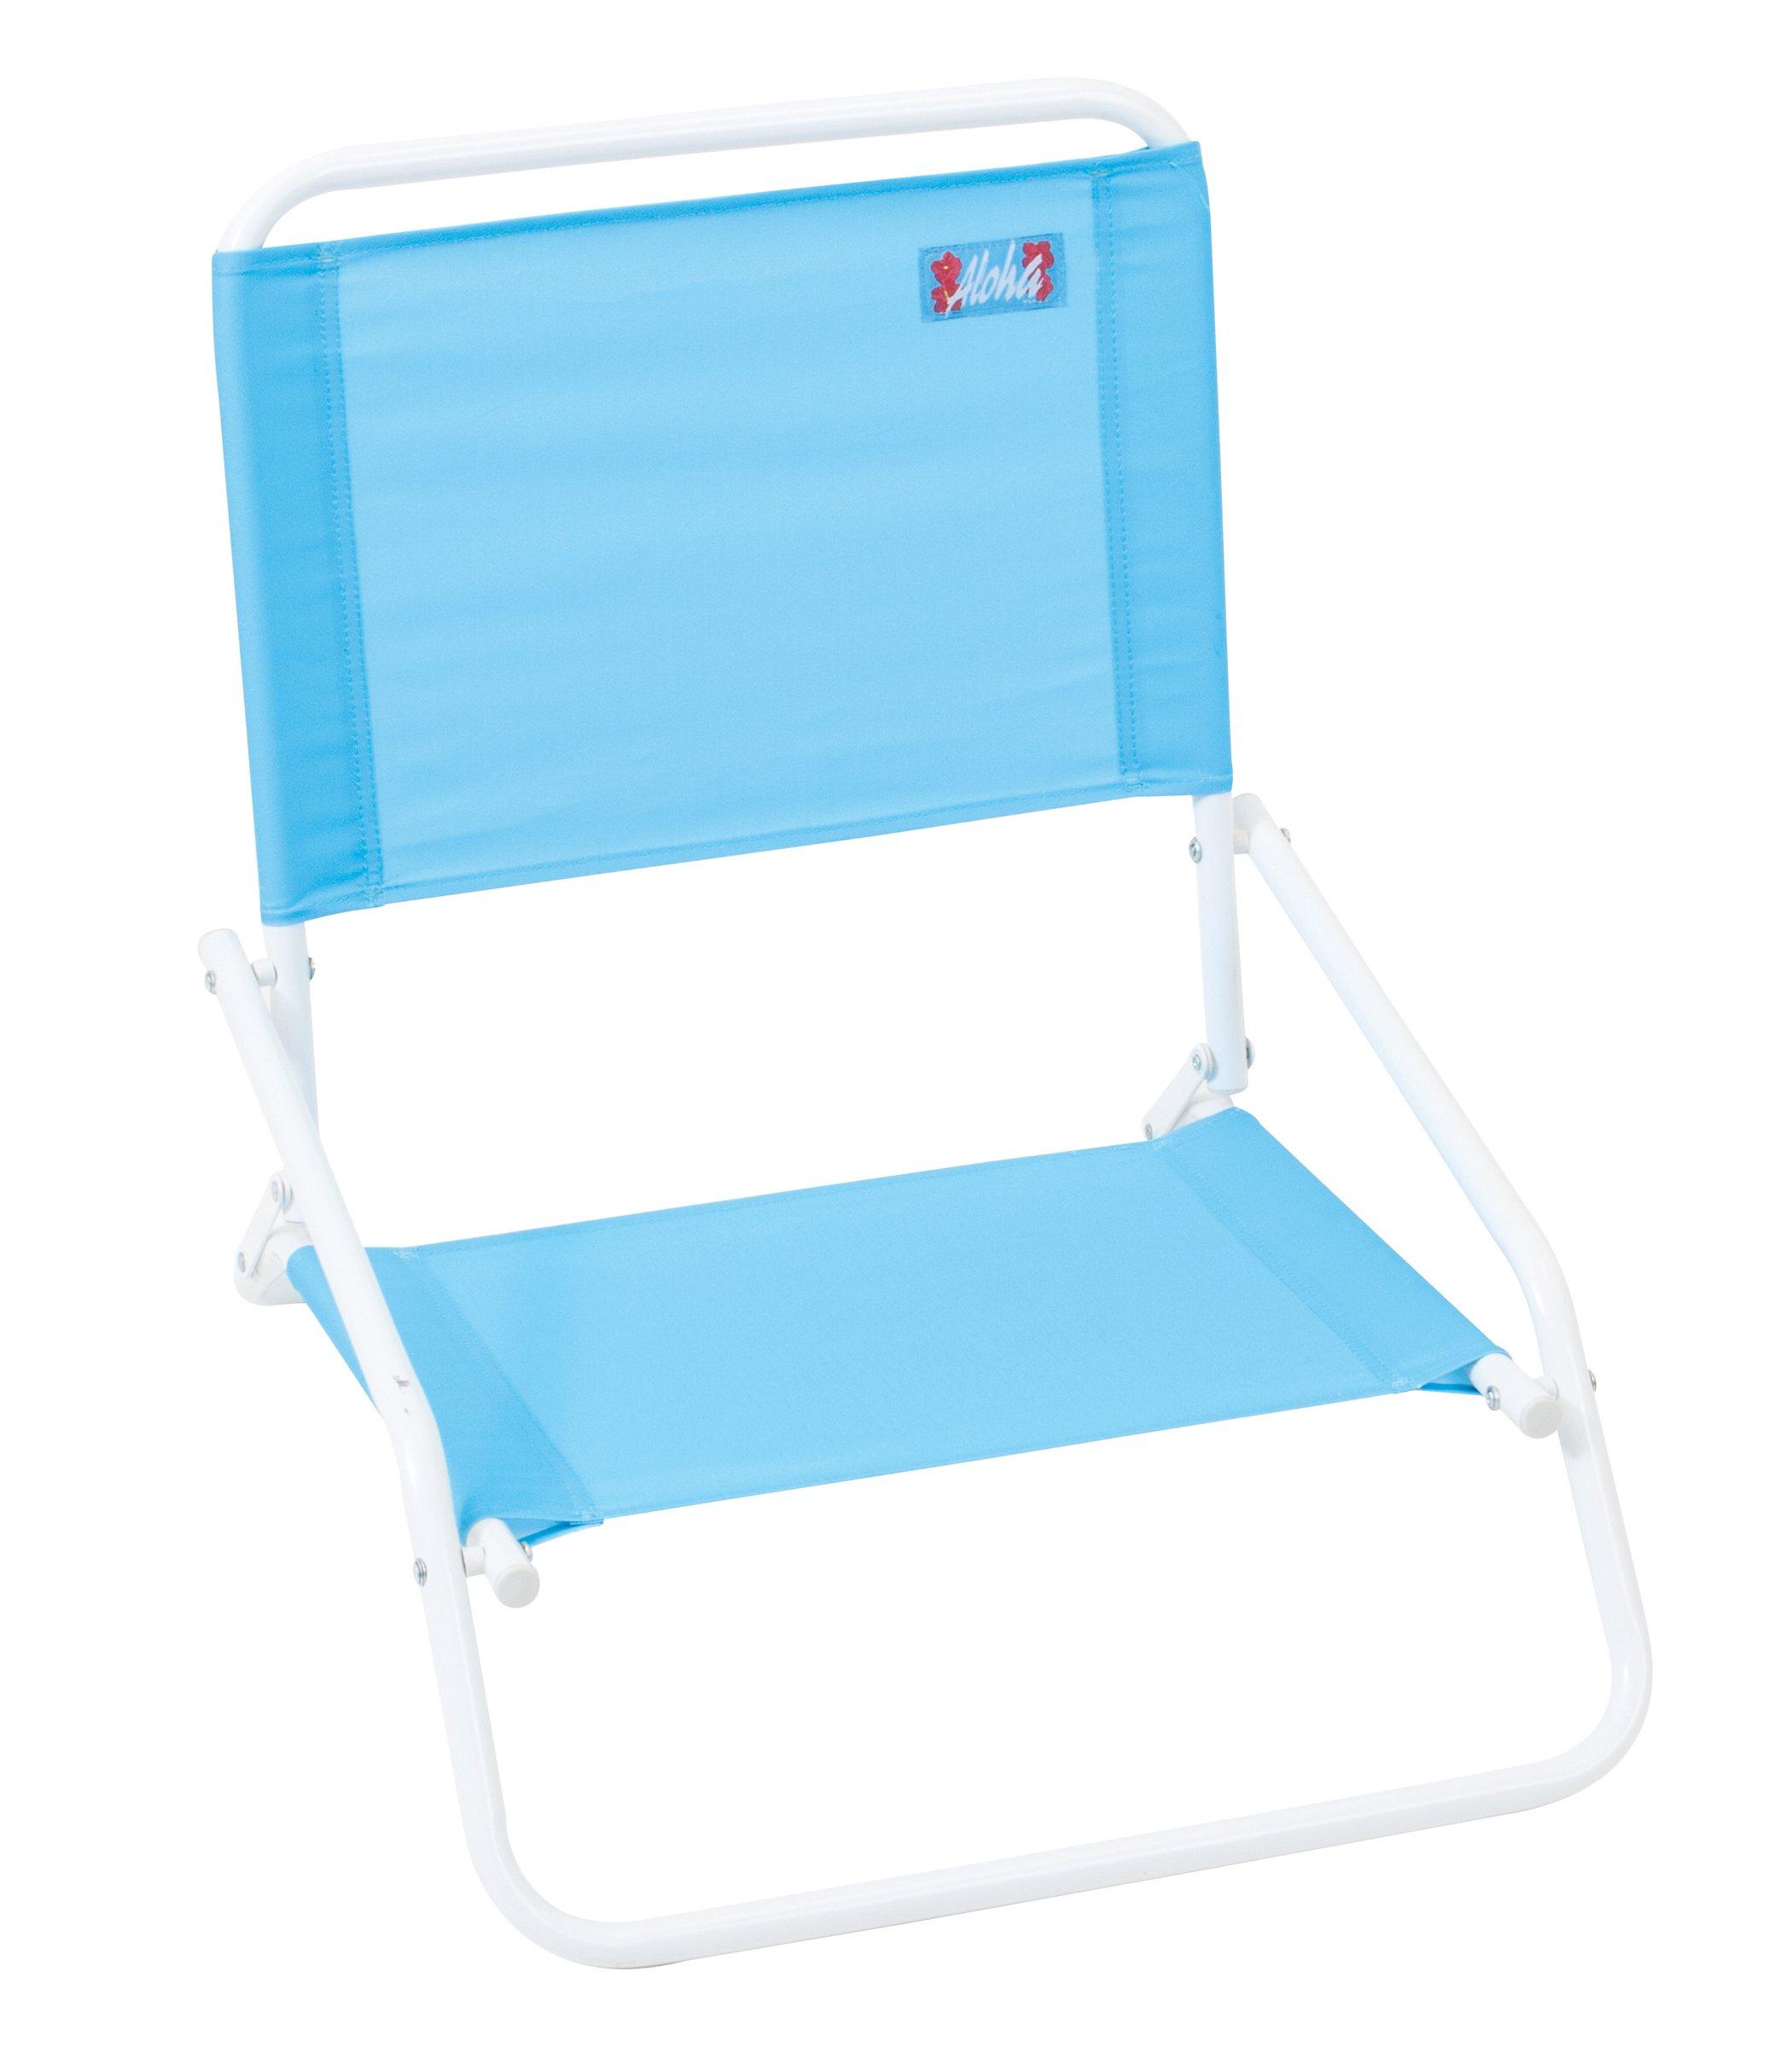 RIO Gear Aloha Sand Chair, Turquoise